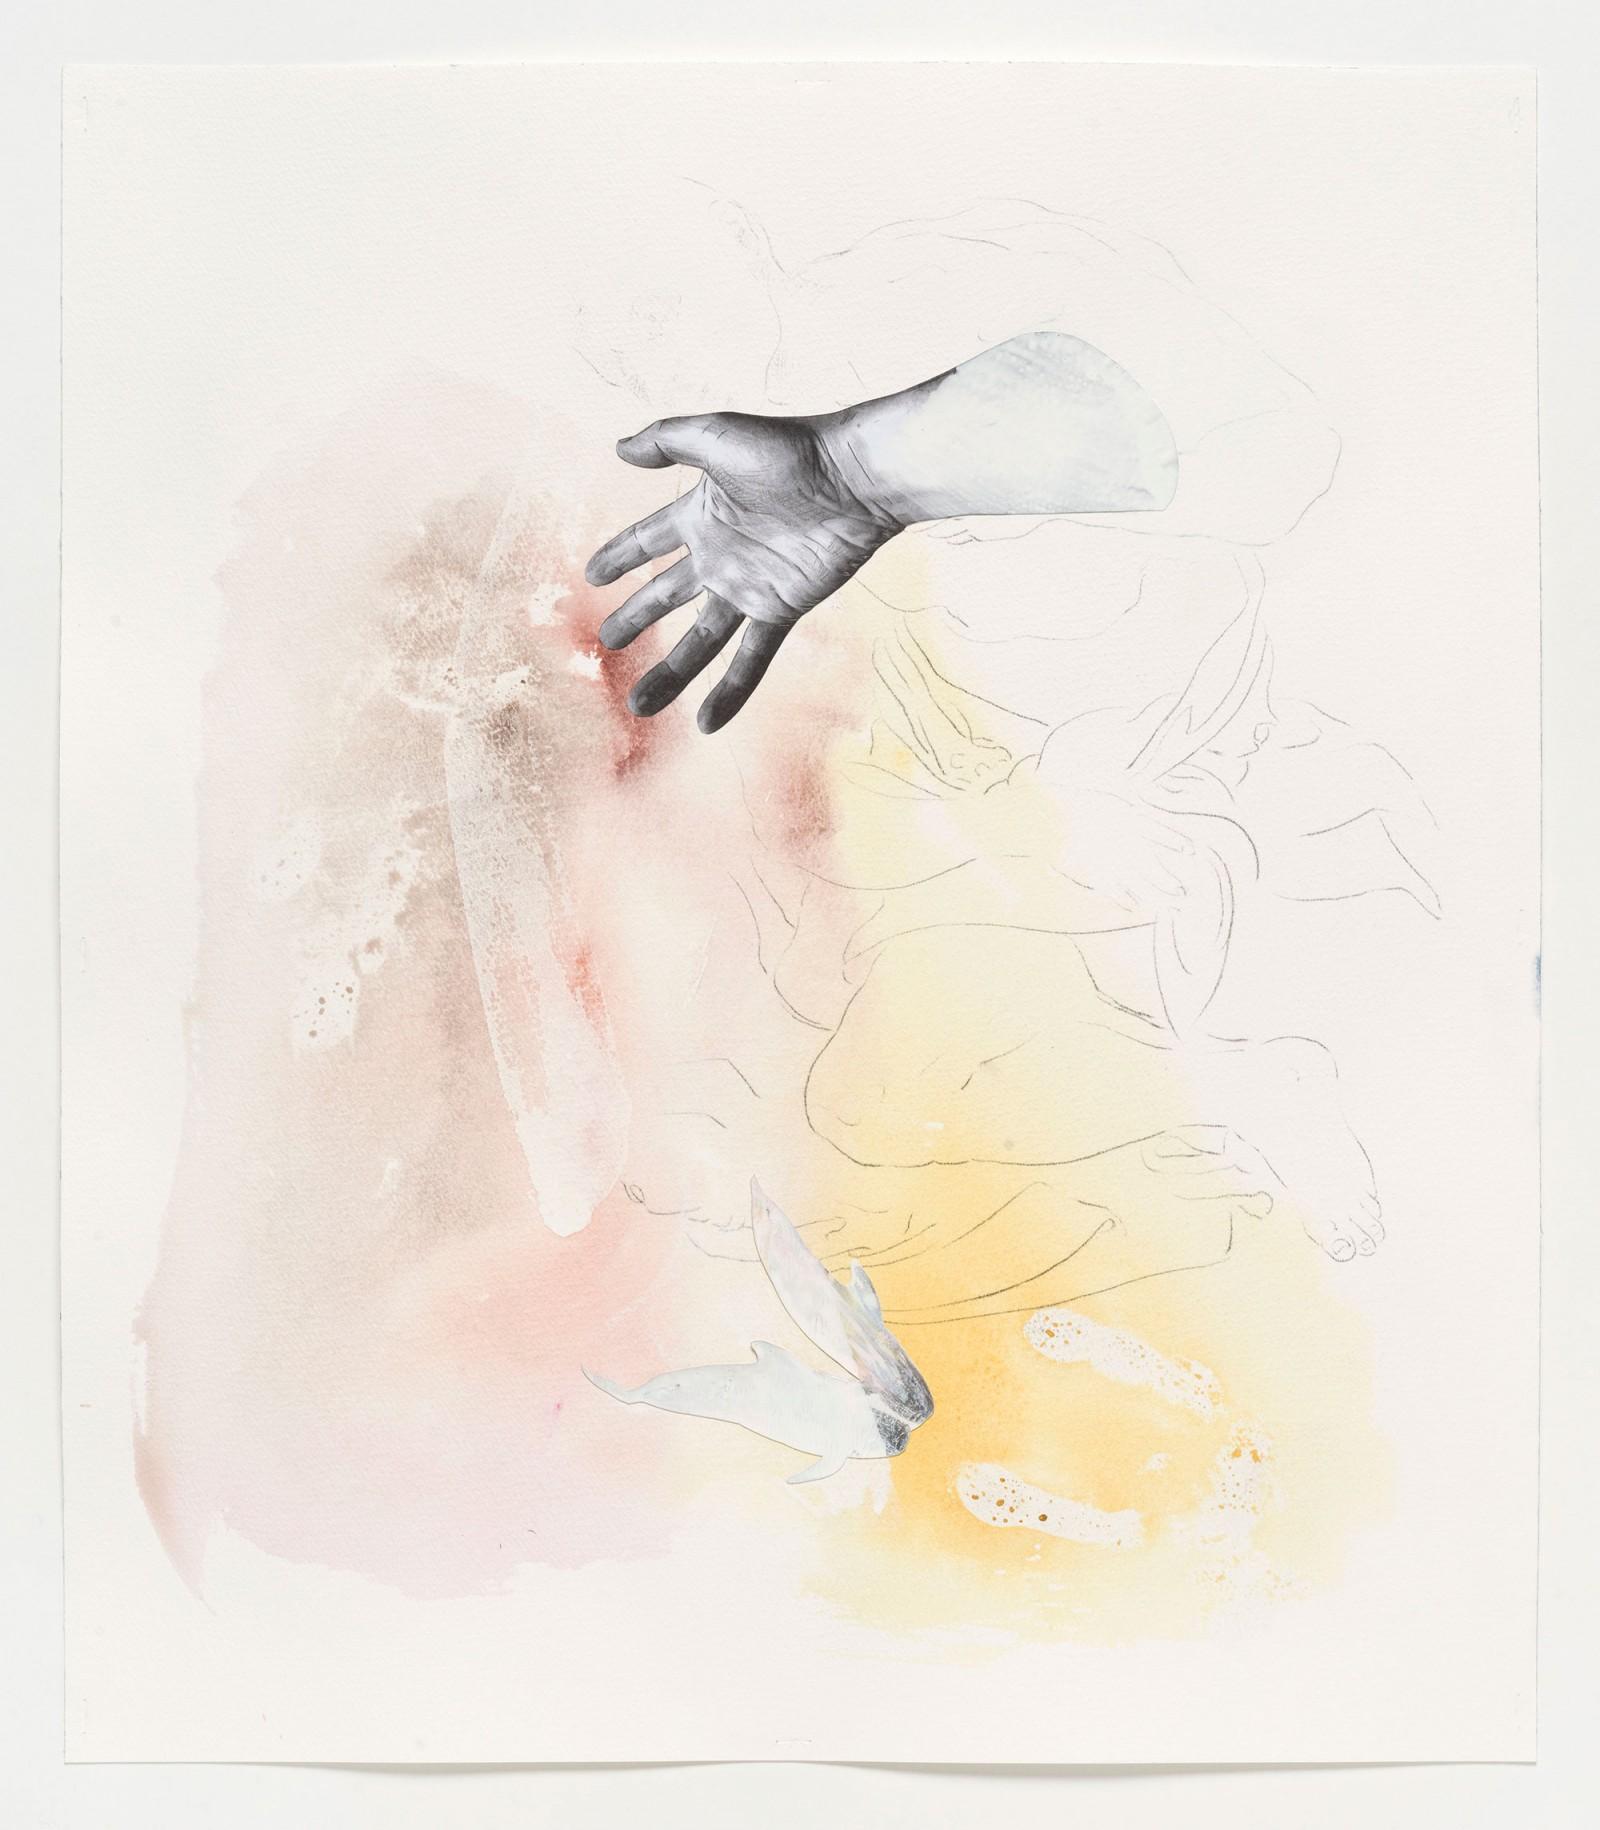 Kim Nekarda: untitled, 2019, carbon, photocopy & watercolour on paper, 53 x 46 cm